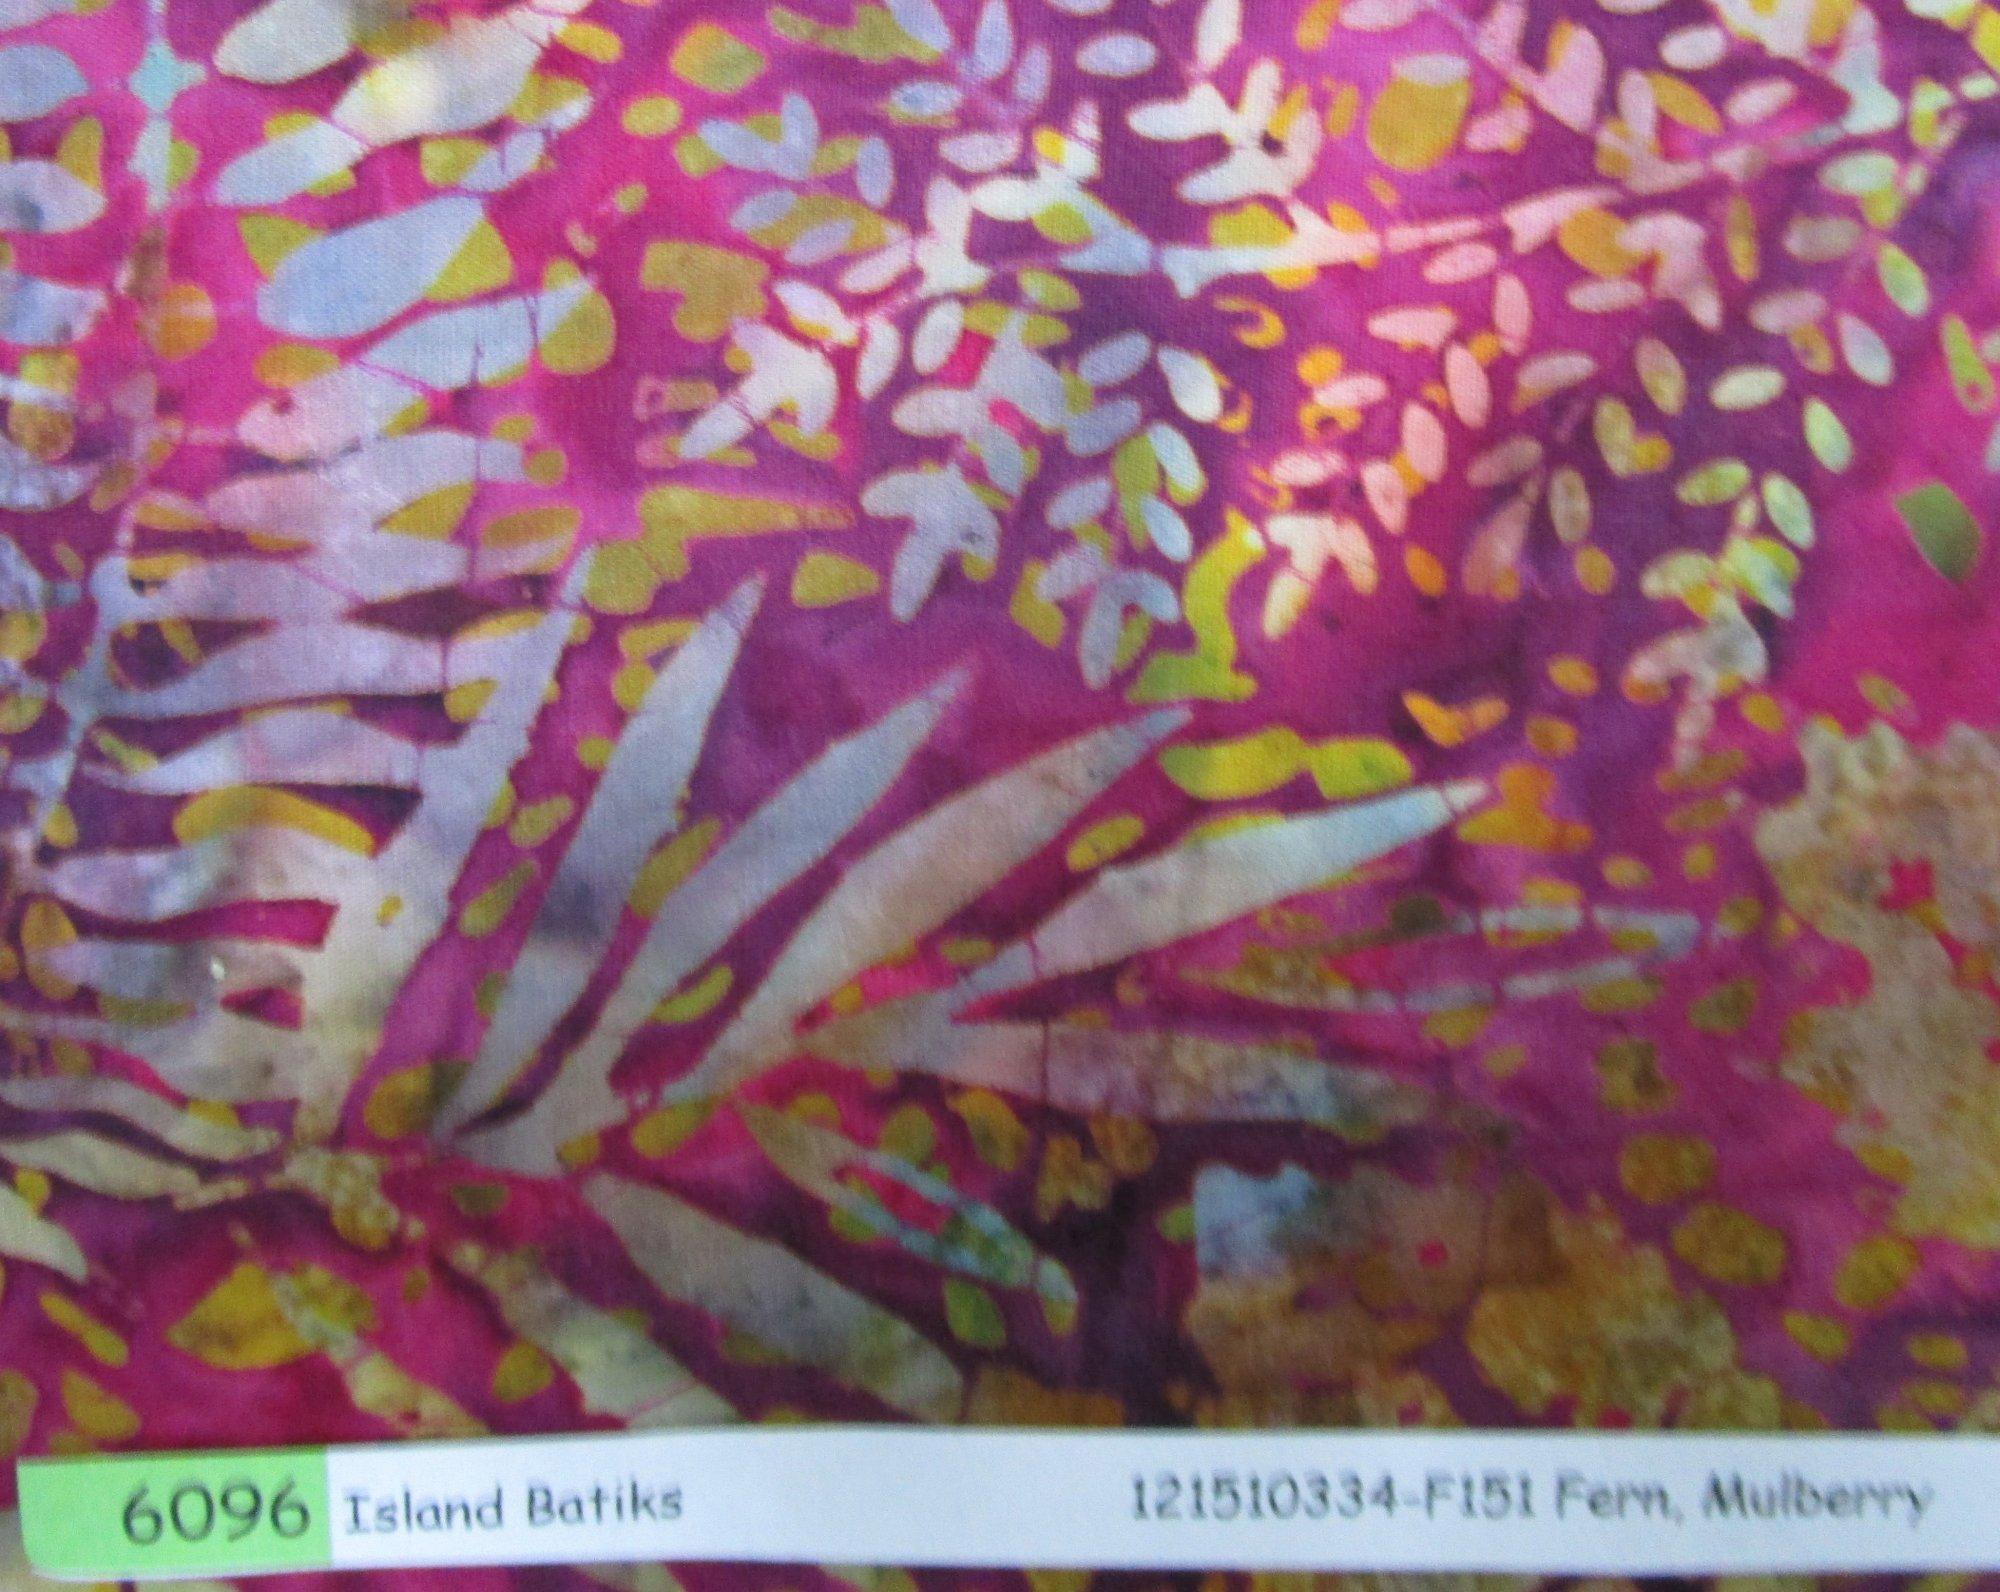 Hoffman Bali Amp Island Batik Fabric For Sale Palo Cedro Ca Blue Iris Quilt Shop